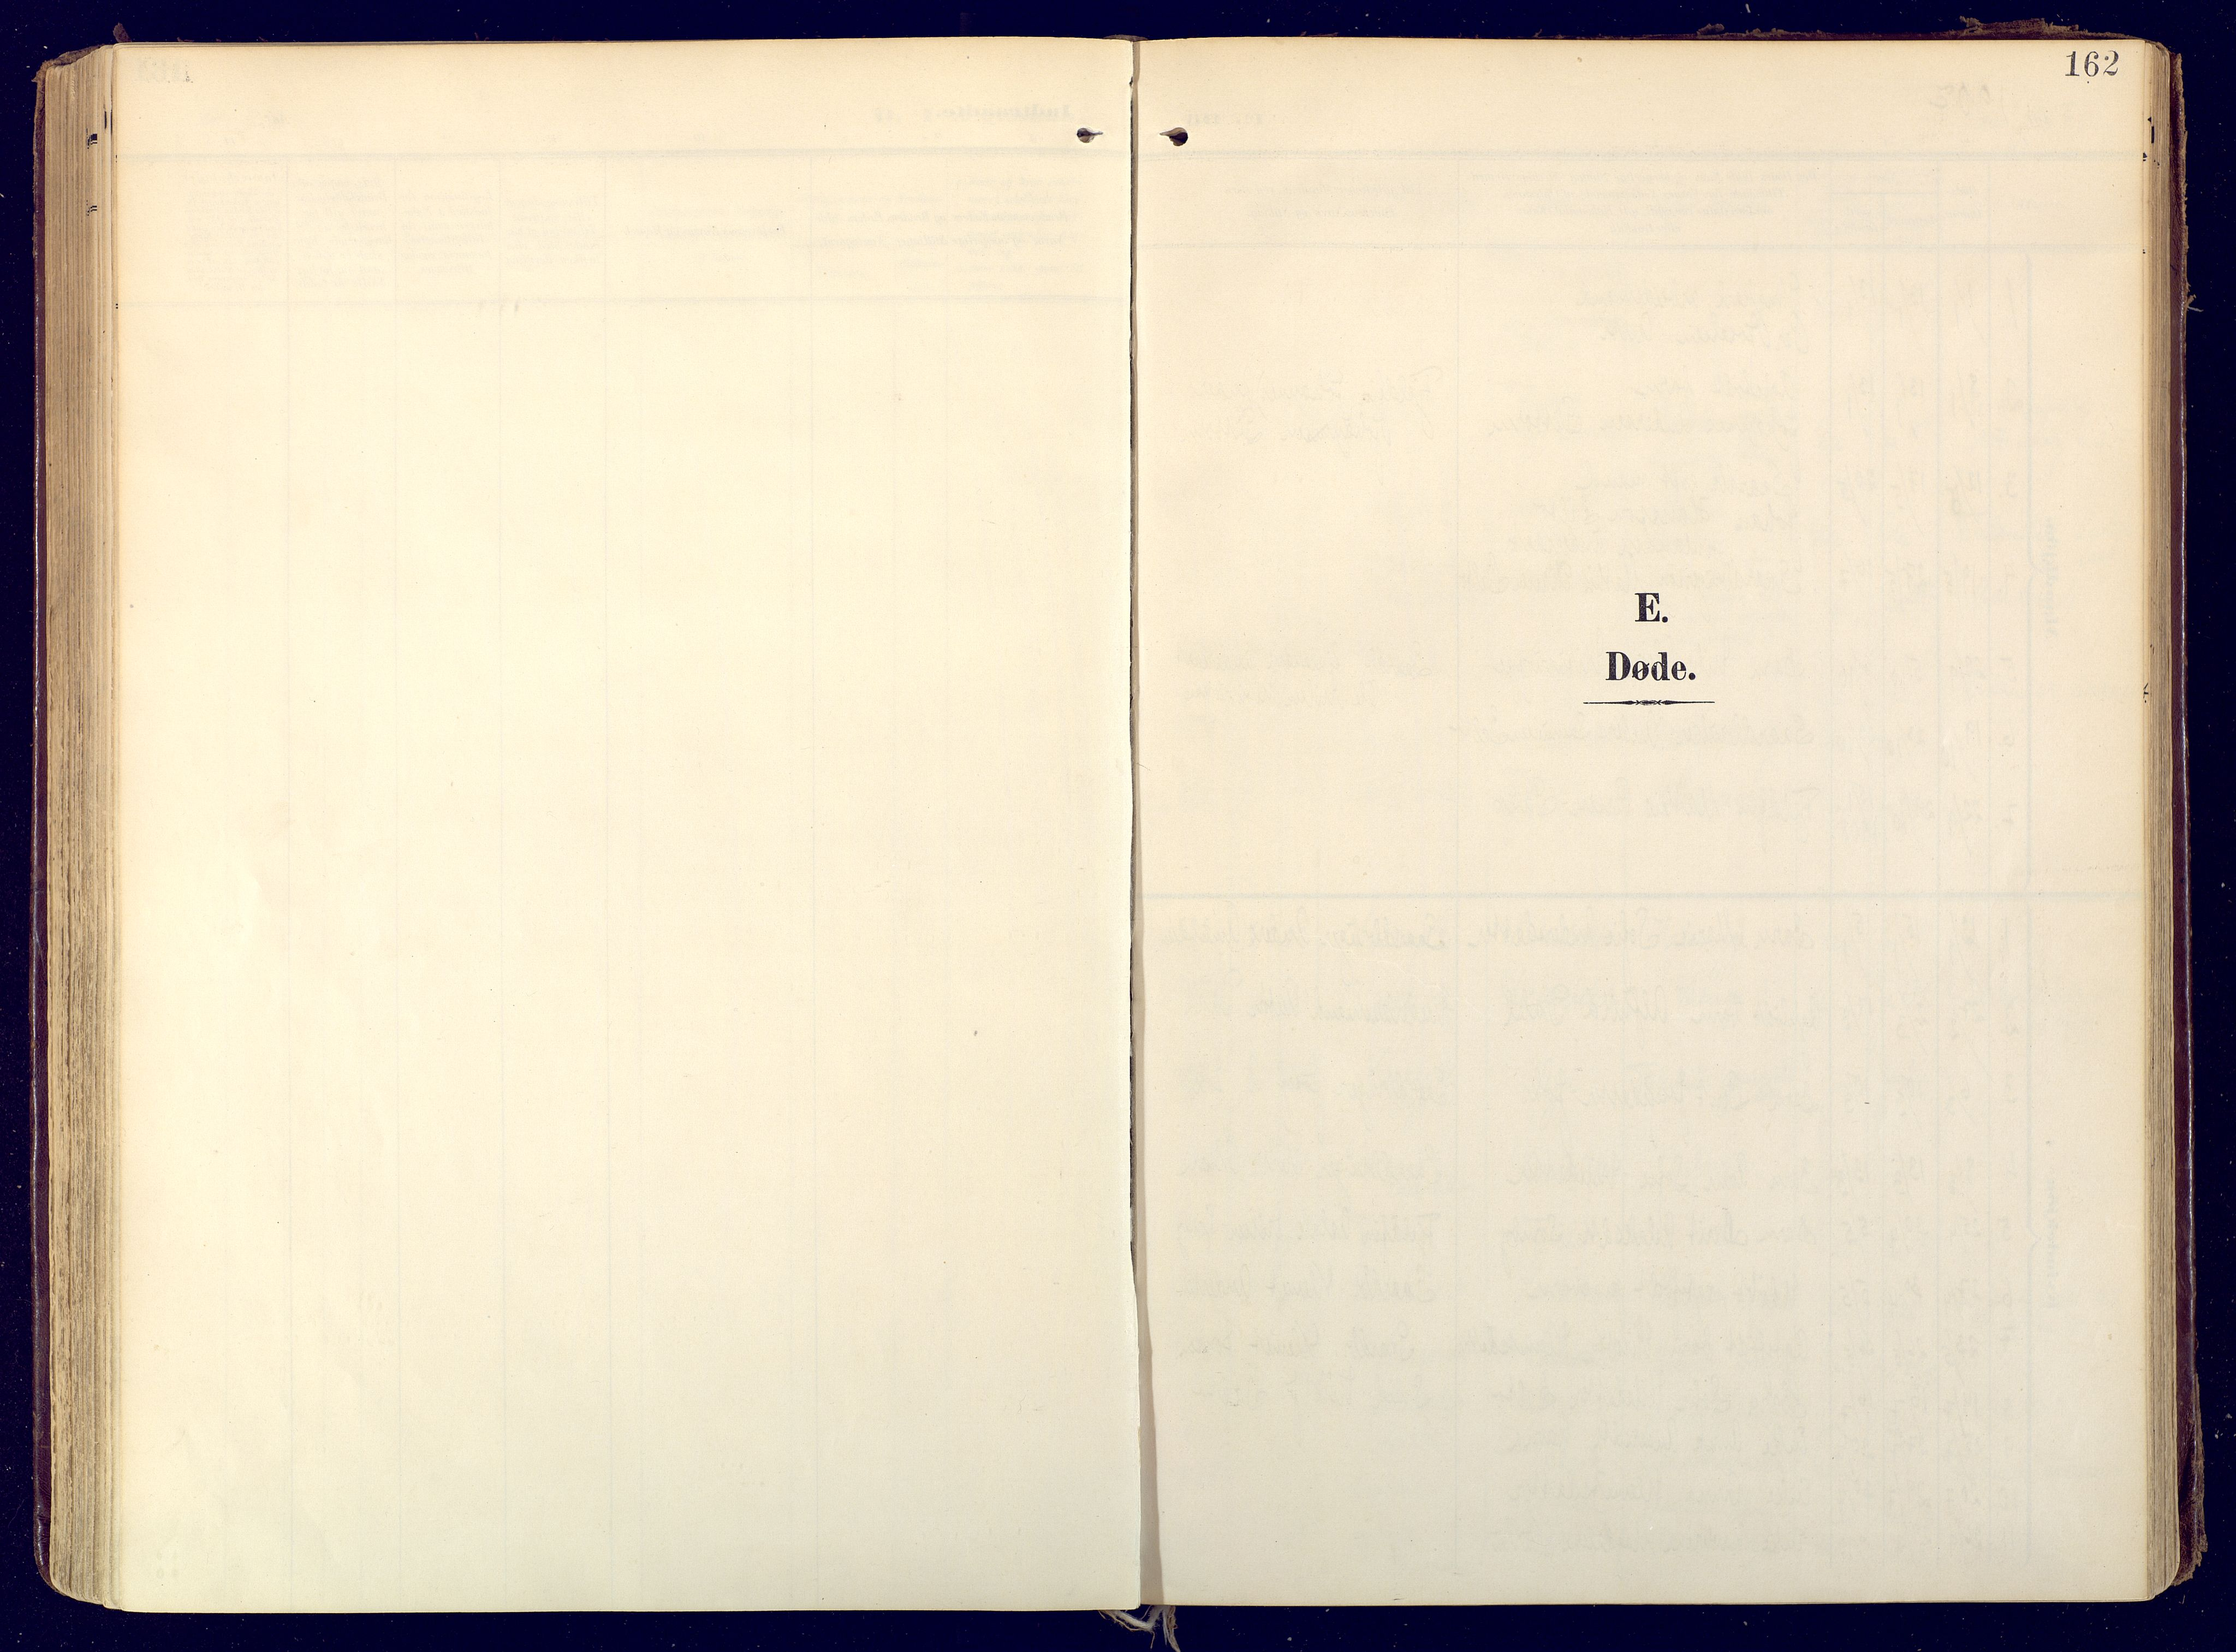 SATØ, Karasjok sokneprestkontor, H/Ha: Ministerialbok nr. 3, 1907-1926, s. 162